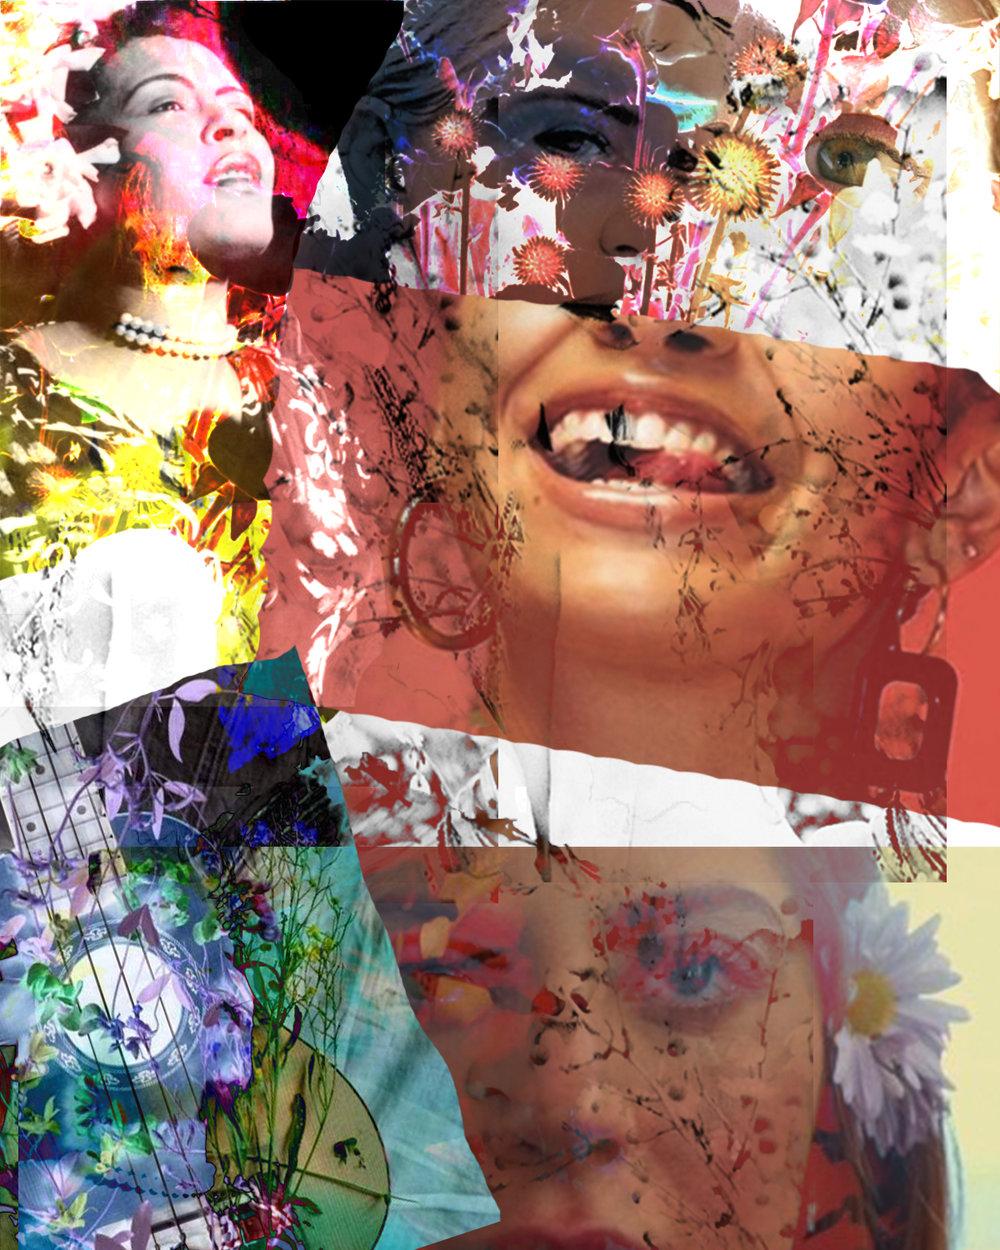 SpringMarketBorder1 copy.jpg